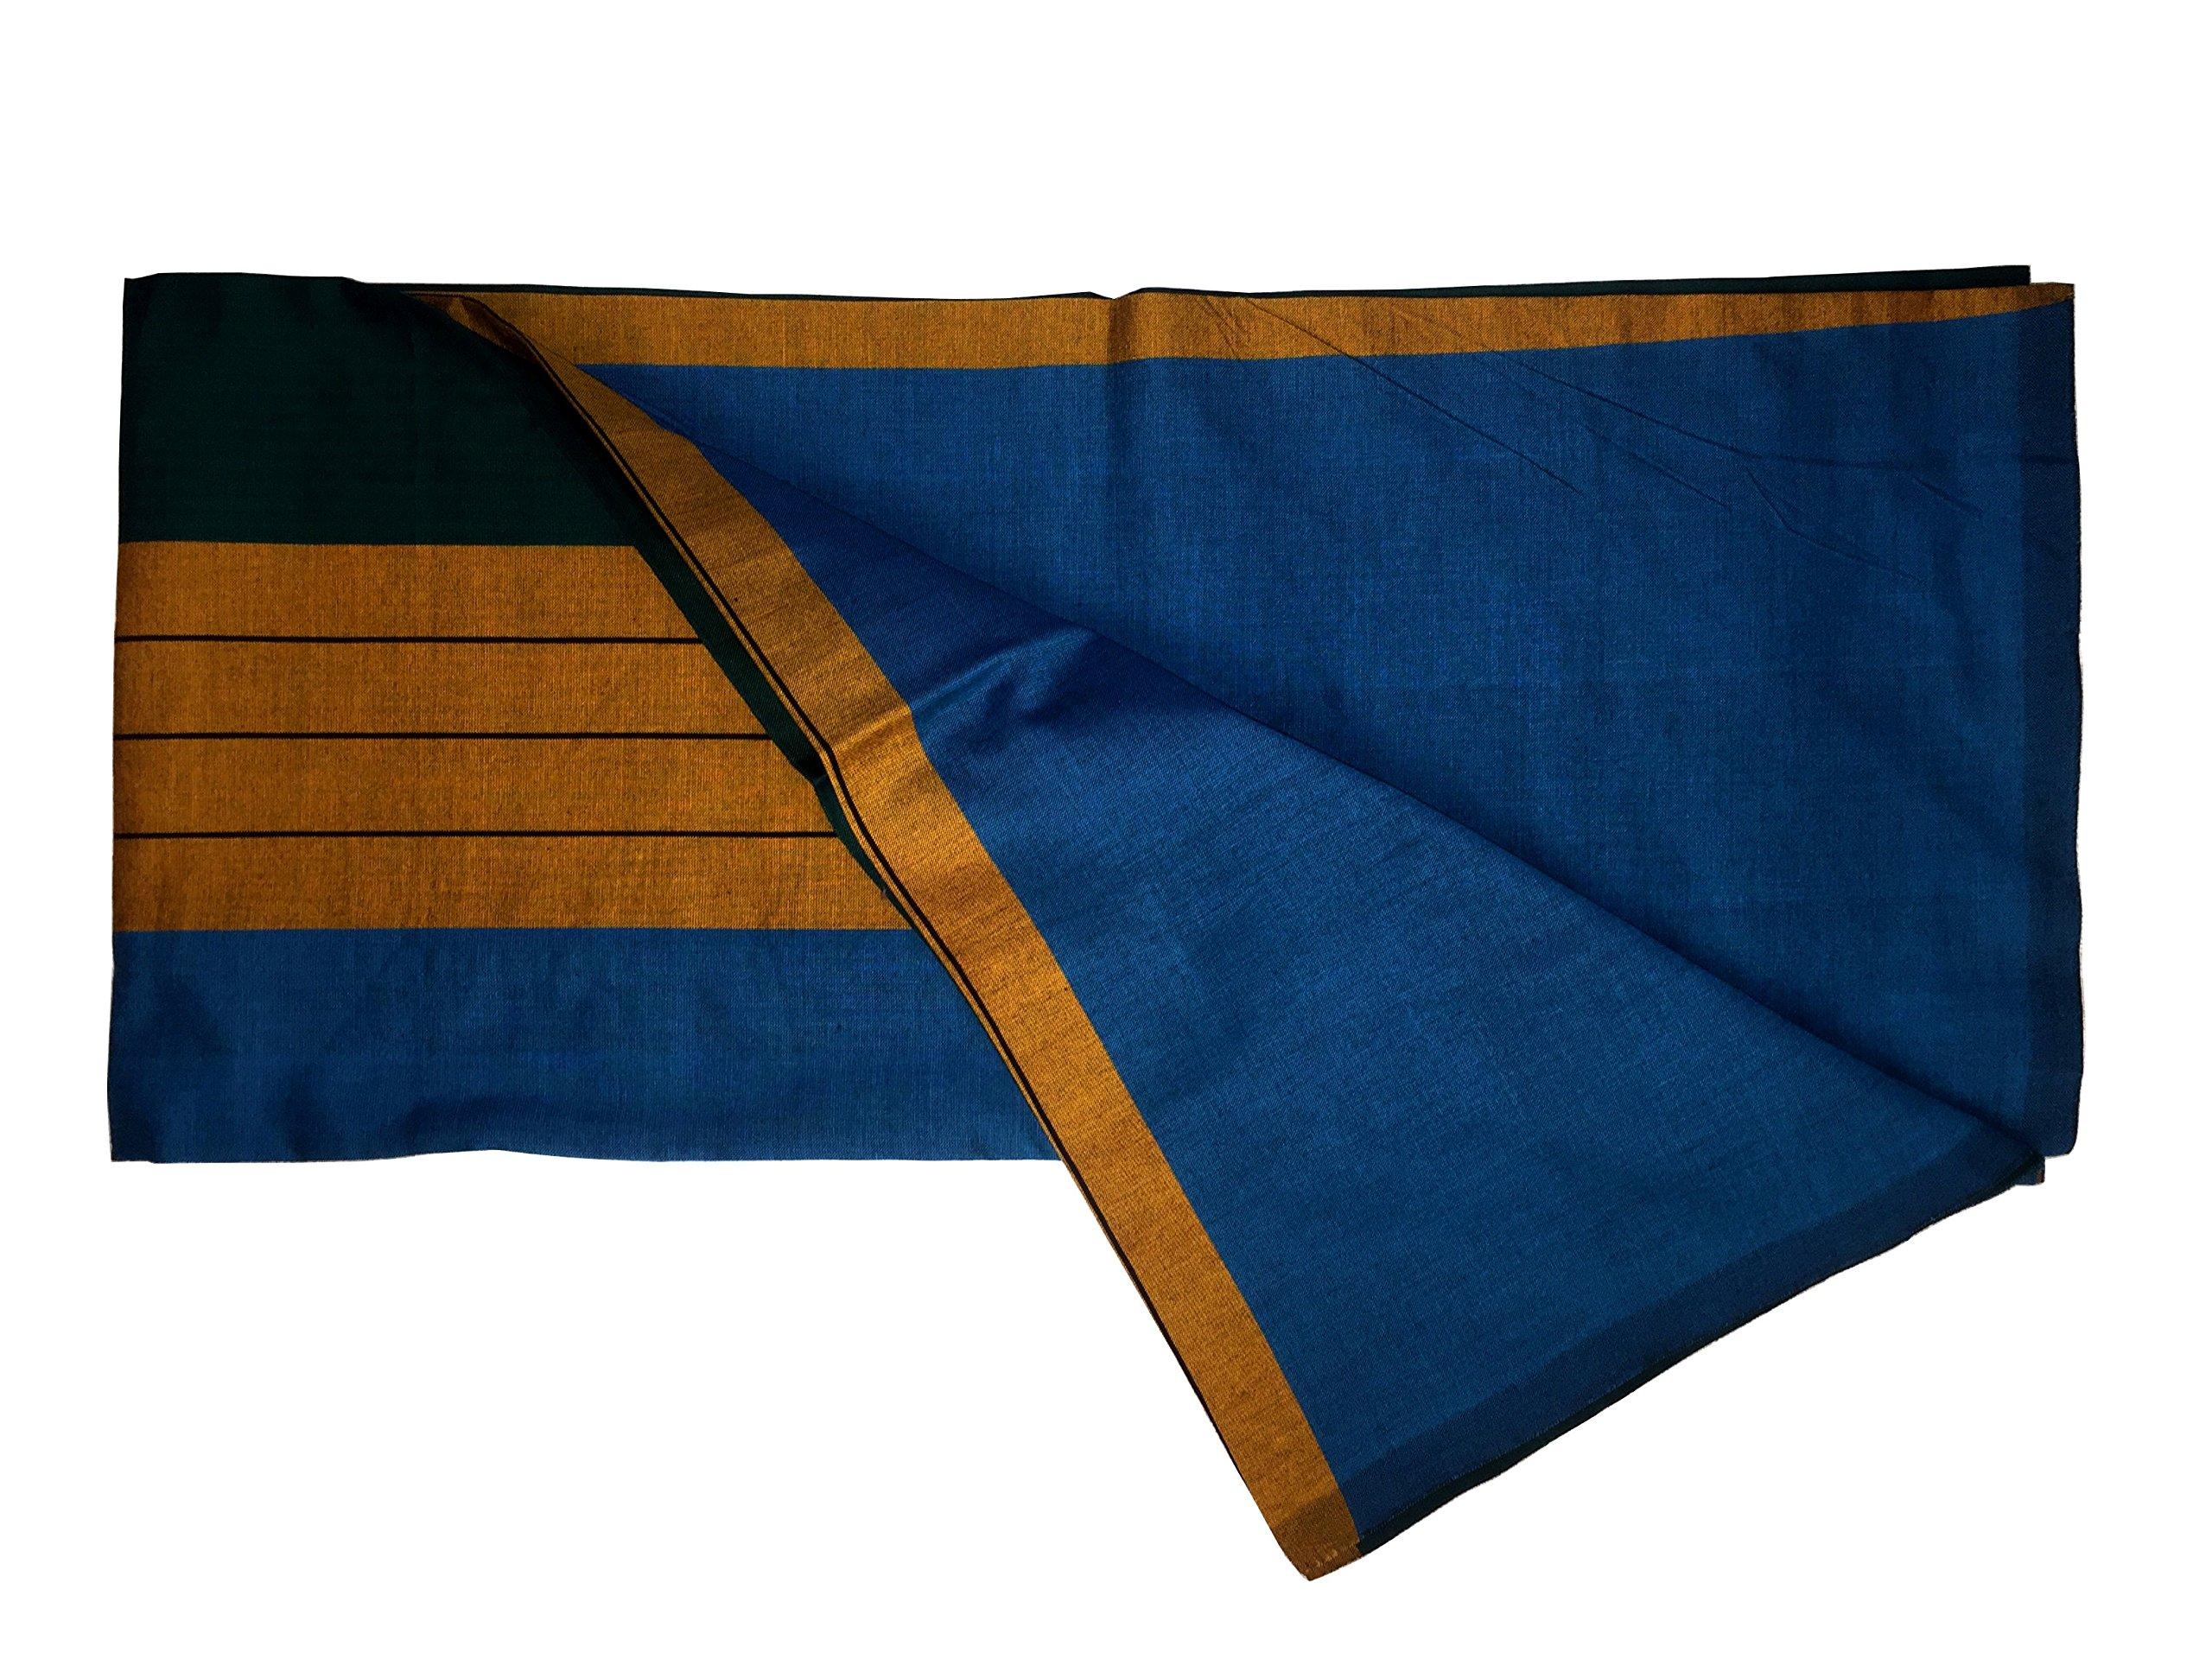 ReenaHANDS Lungi Sarong Mens Handloom Lungi Sarong 100% Cotton. Stitched Tube Sarong. Assorted Color/Design by ReenaHANDS (Image #2)